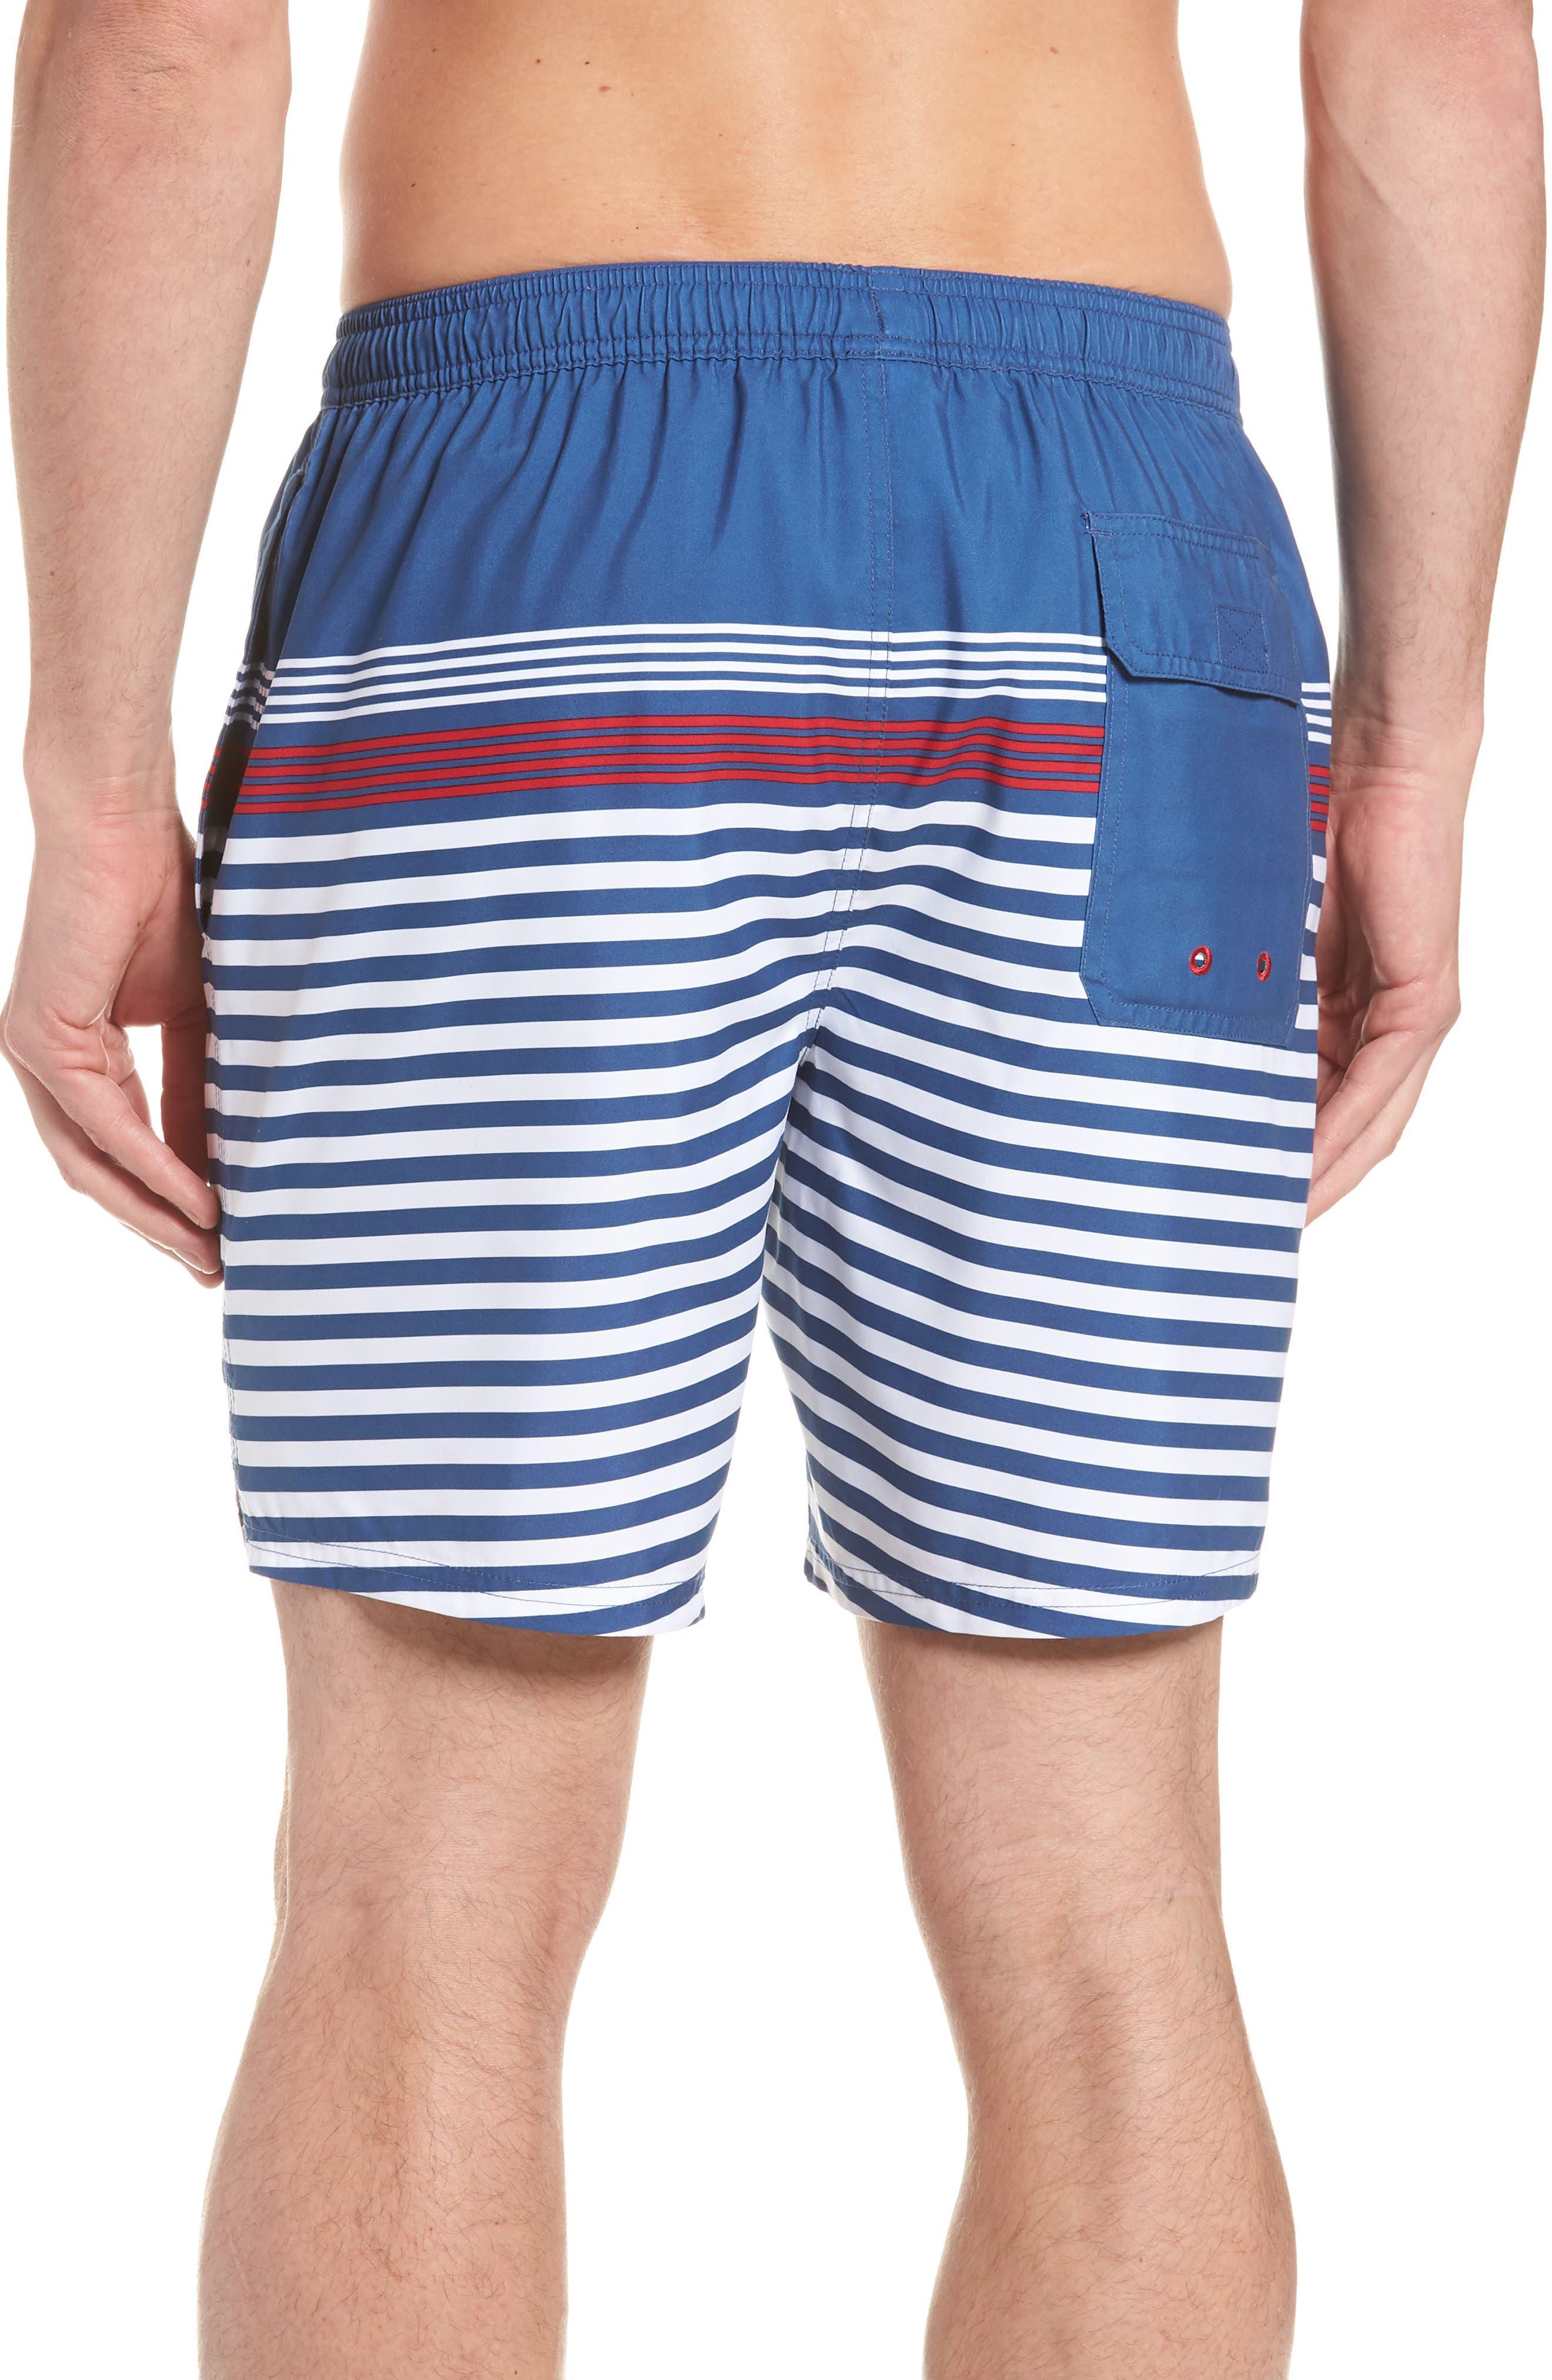 Chappy Summerall Stripe Swim Trunks,                             Alternate thumbnail 2, color,                             461